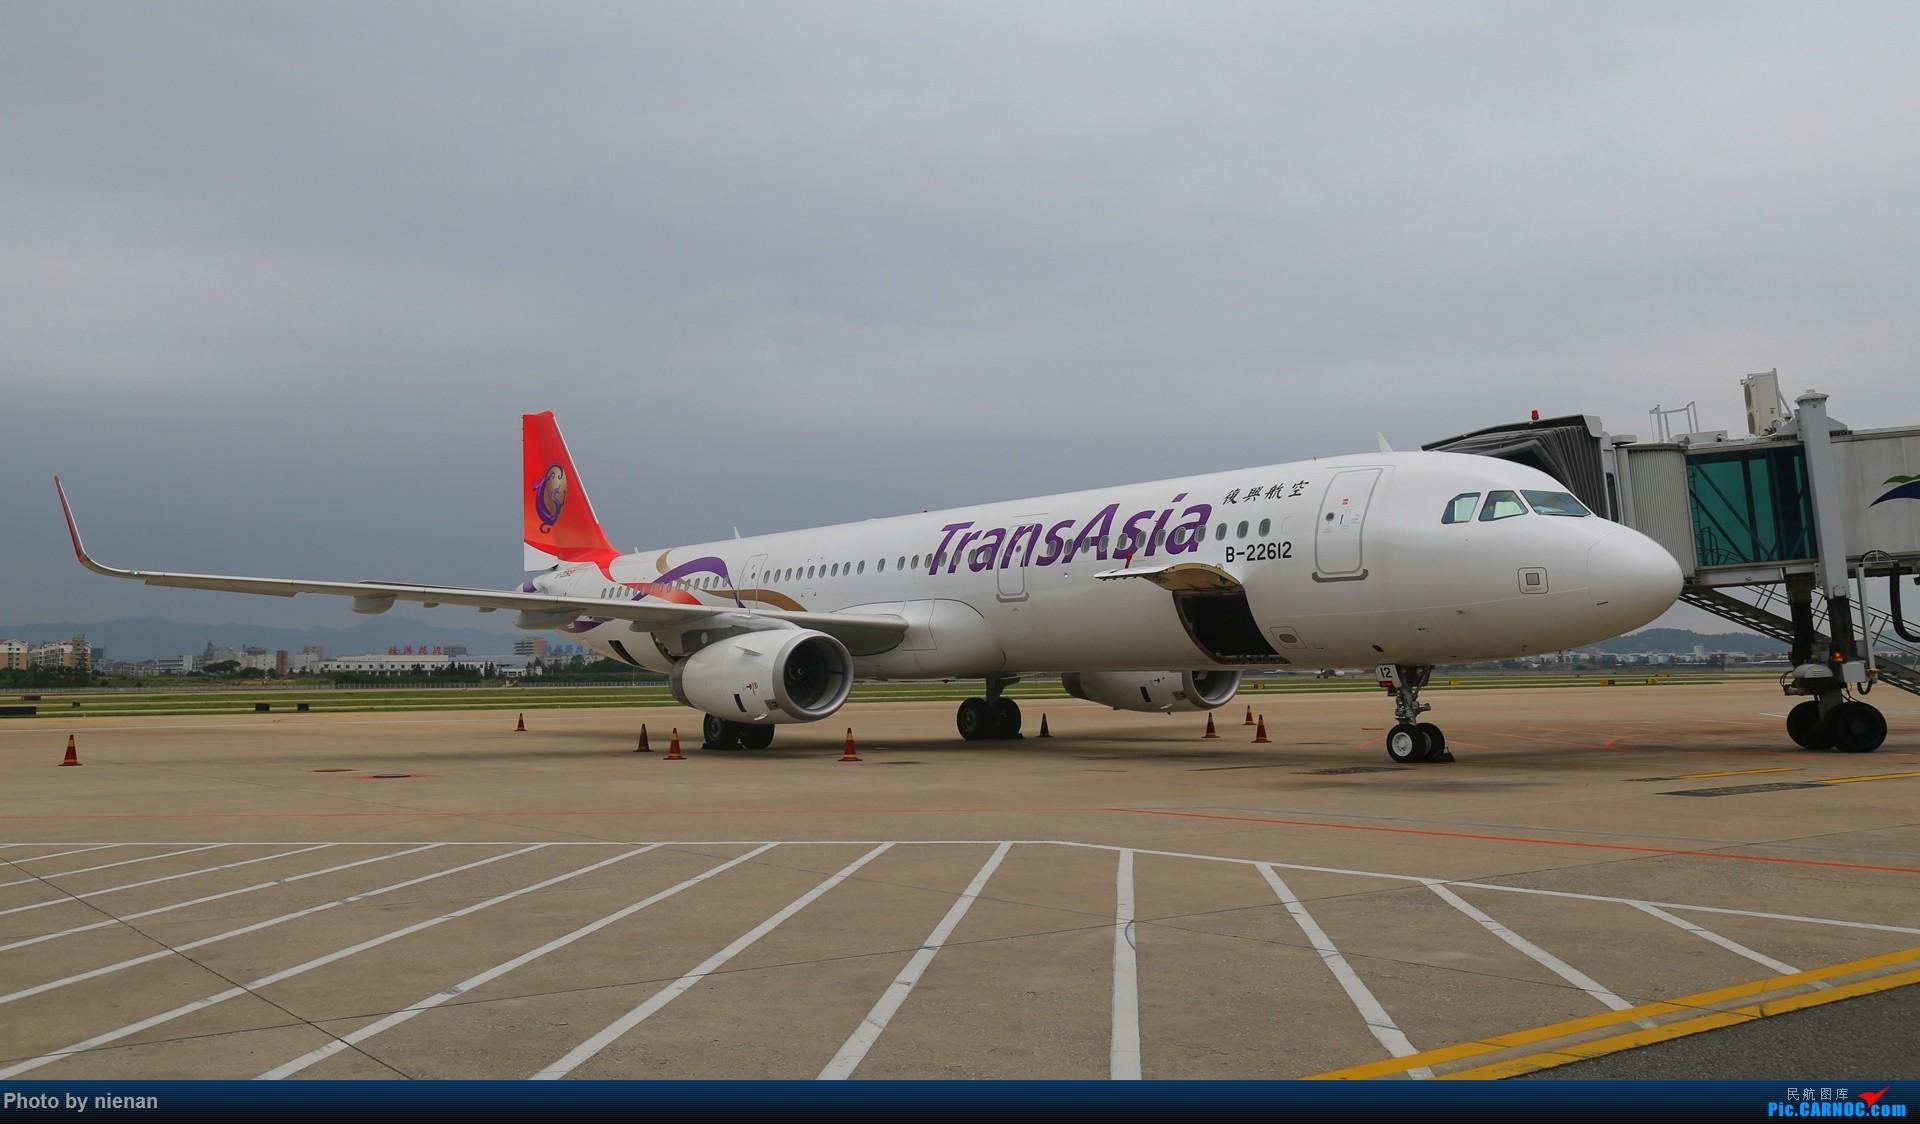 Re:[原创]那年的FOC内场 1 AIRBUS A321-200 B-22612 中国福州长乐国际机场